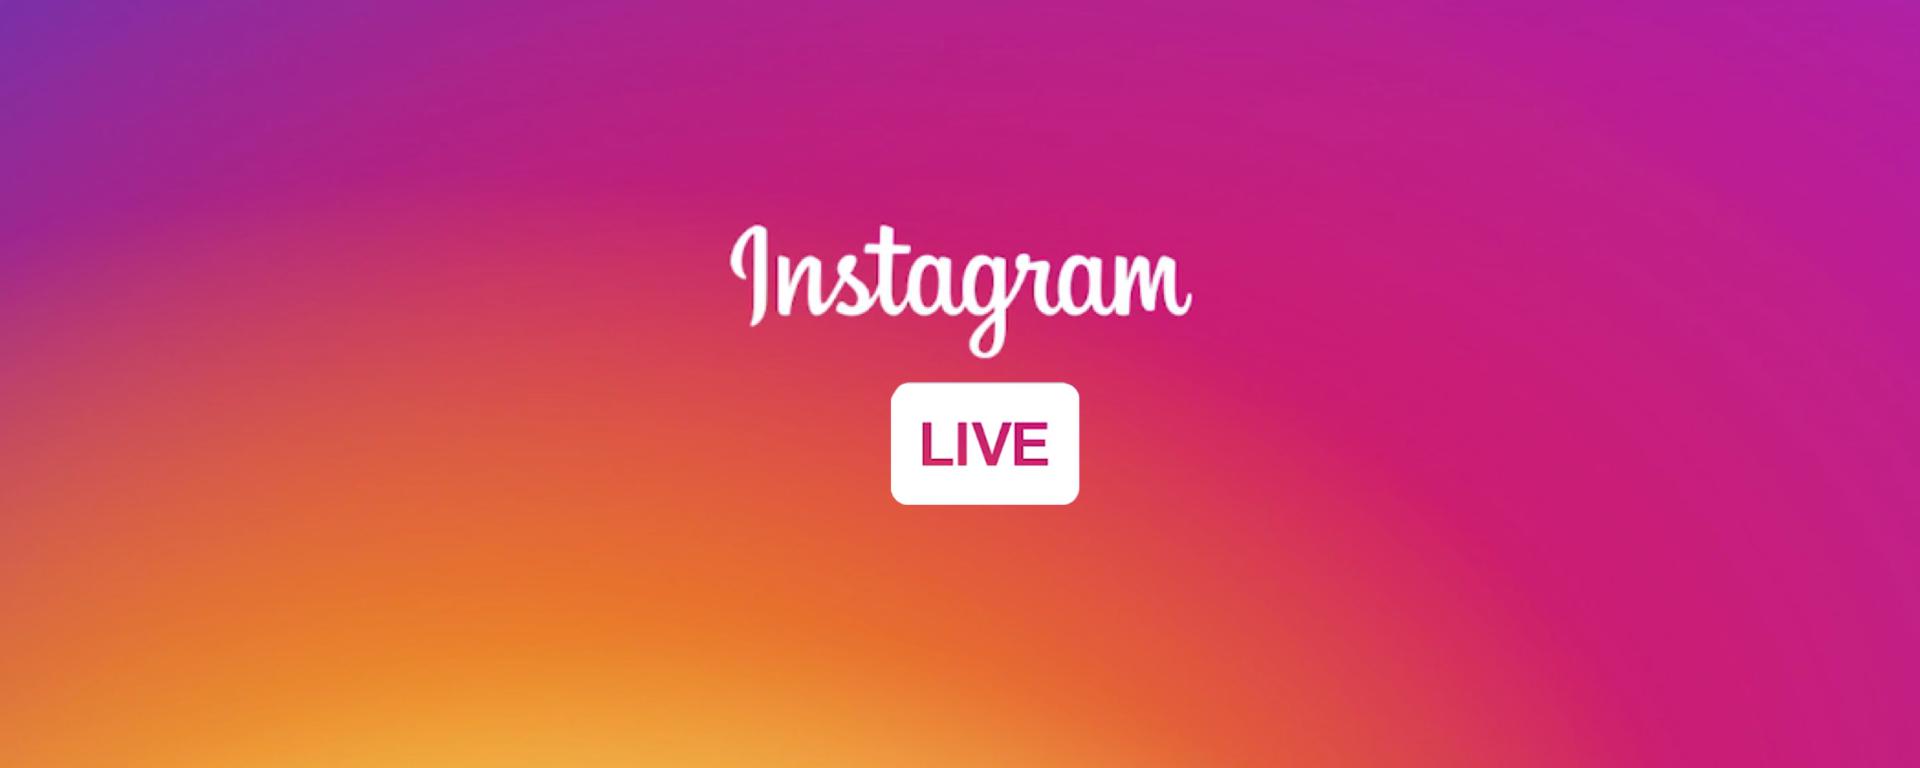 grabar instagram live